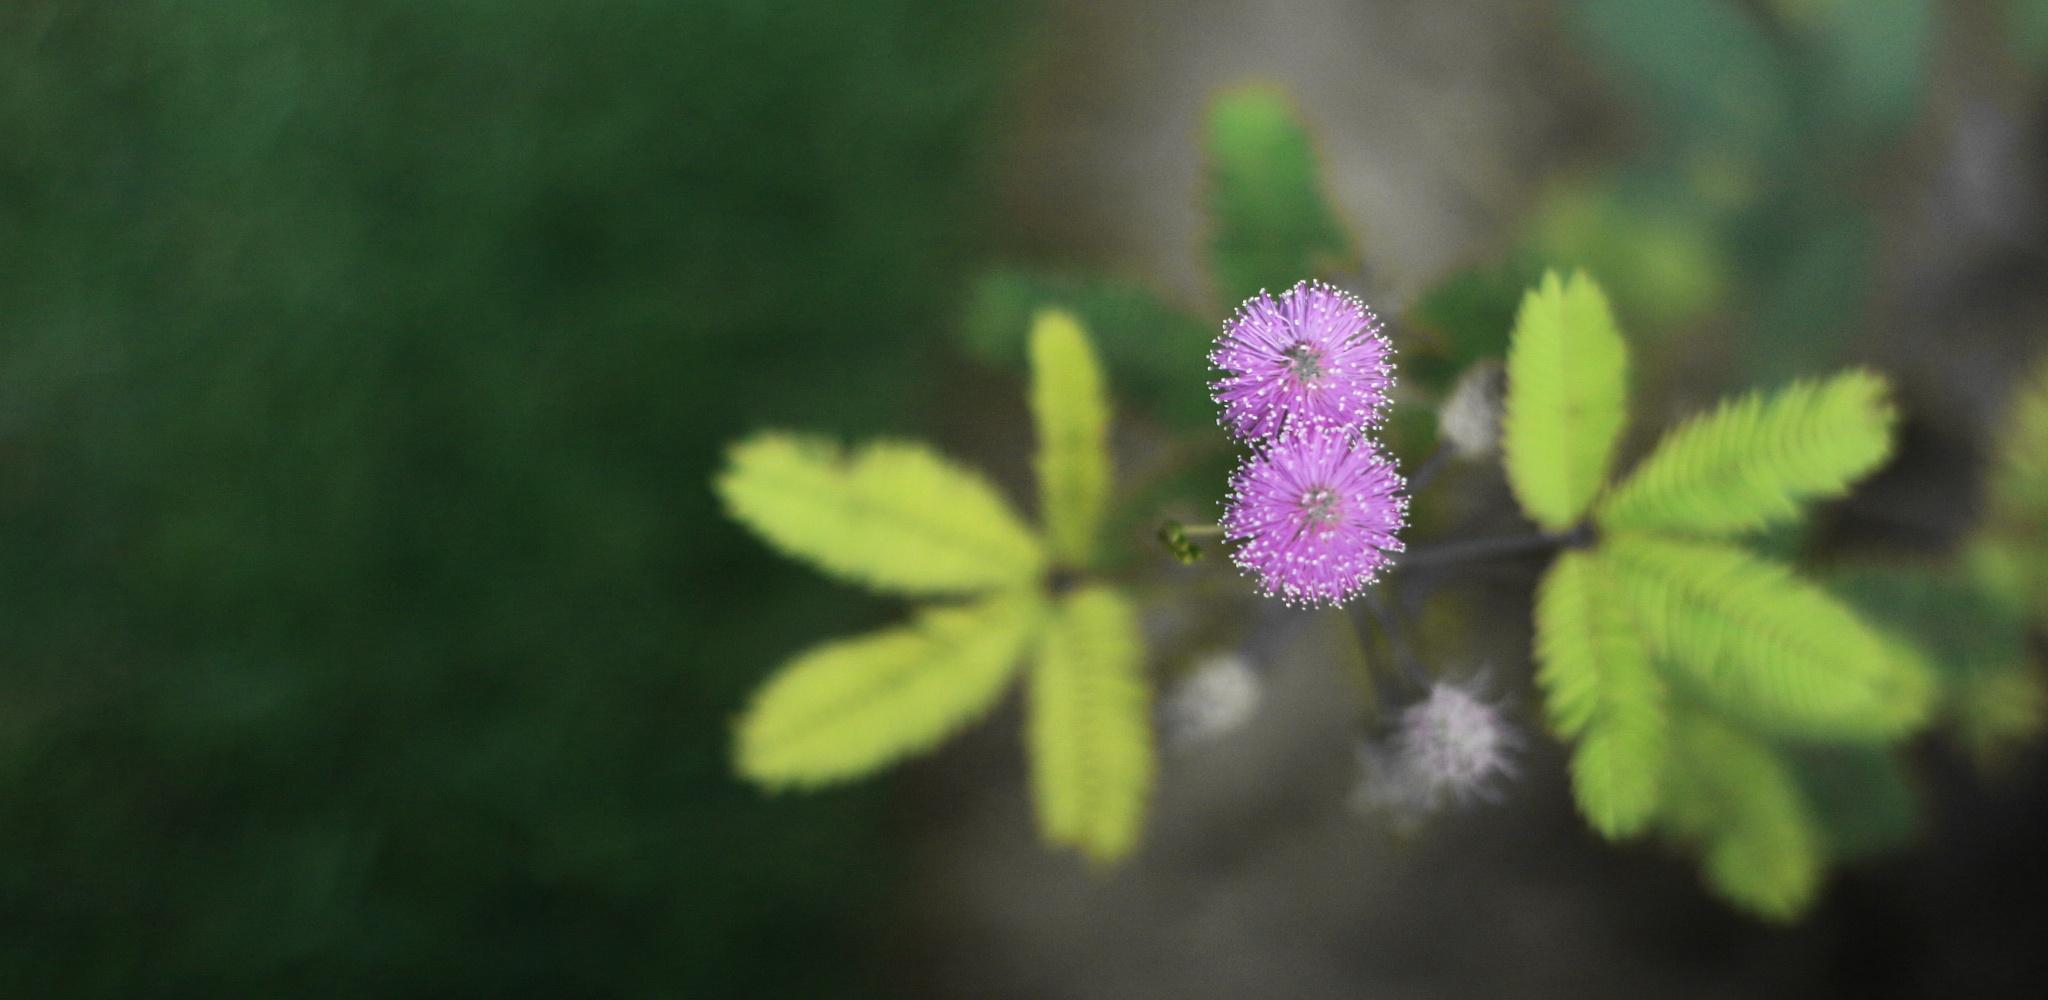 delicate moments by GitiThadani